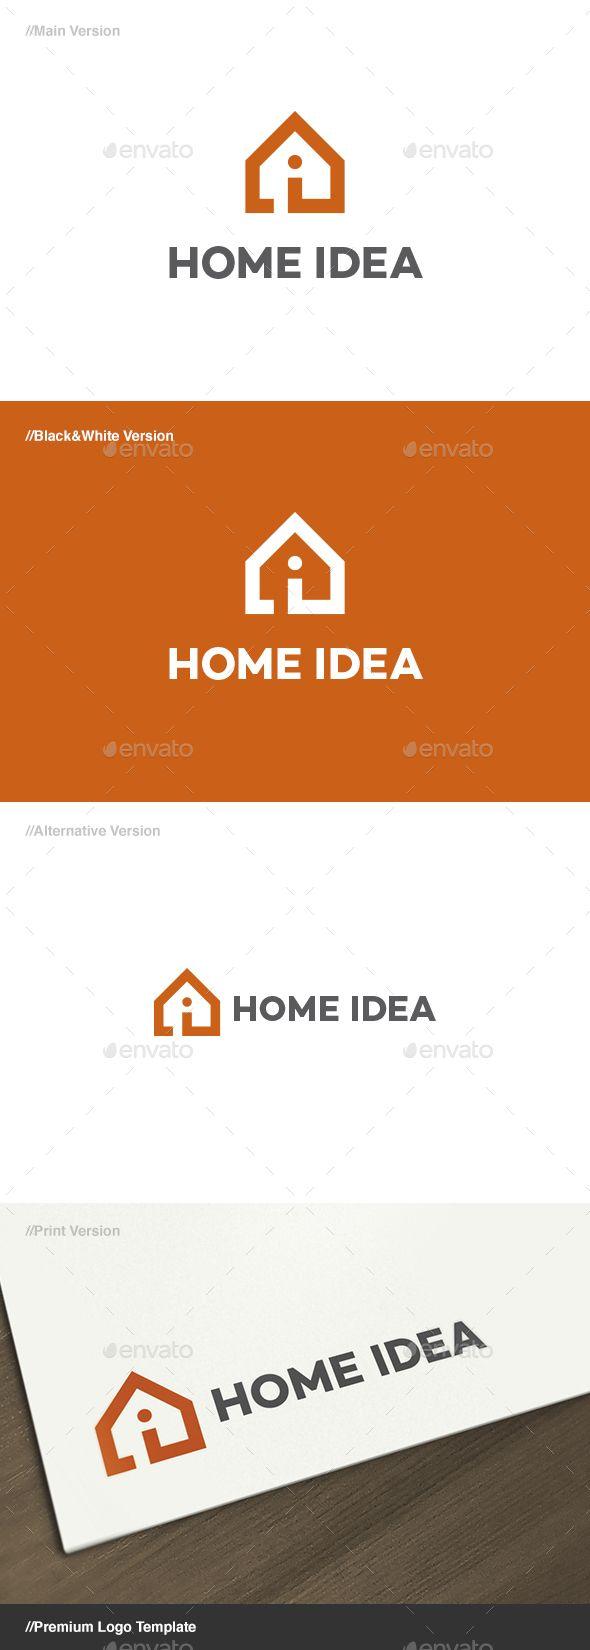 Home Idea Logo — Vector EPS #interior design #home • Available here → https://graphicriver.net/item/home-idea-logo/17532665?ref=pxcr